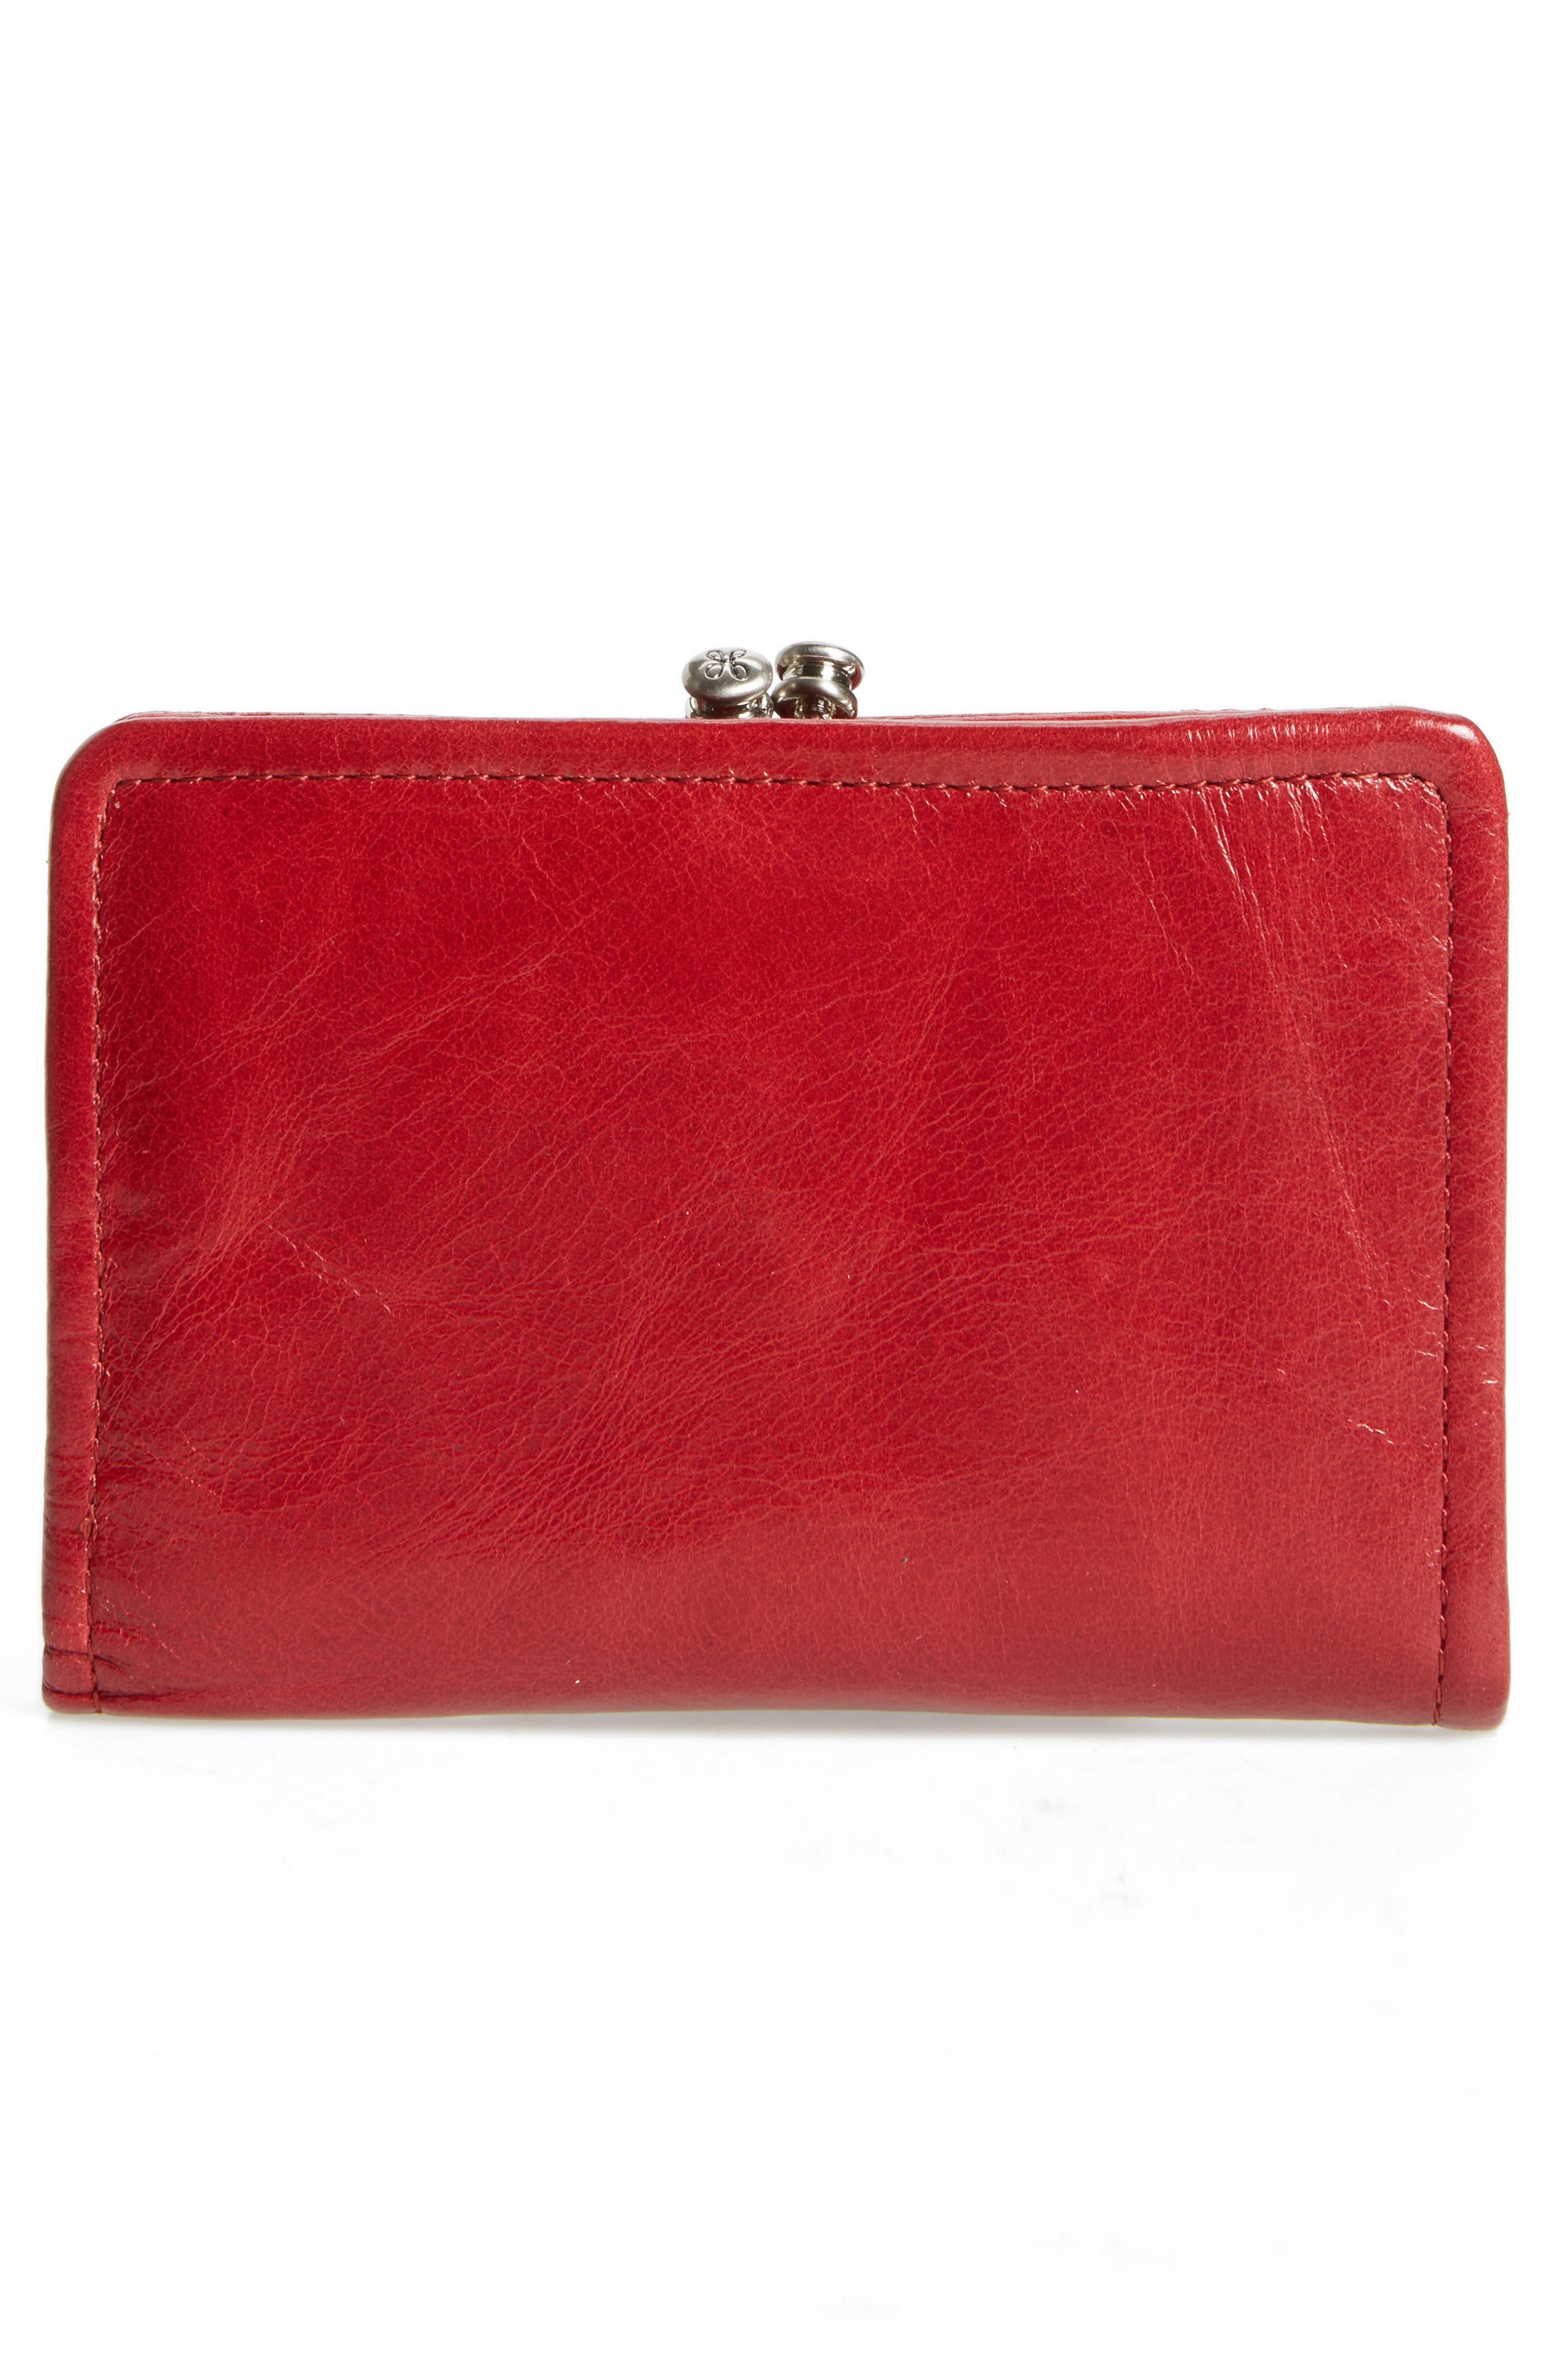 Delta Calfskin Leather Wallet,                             Alternate thumbnail 3, color,                             Cardinal